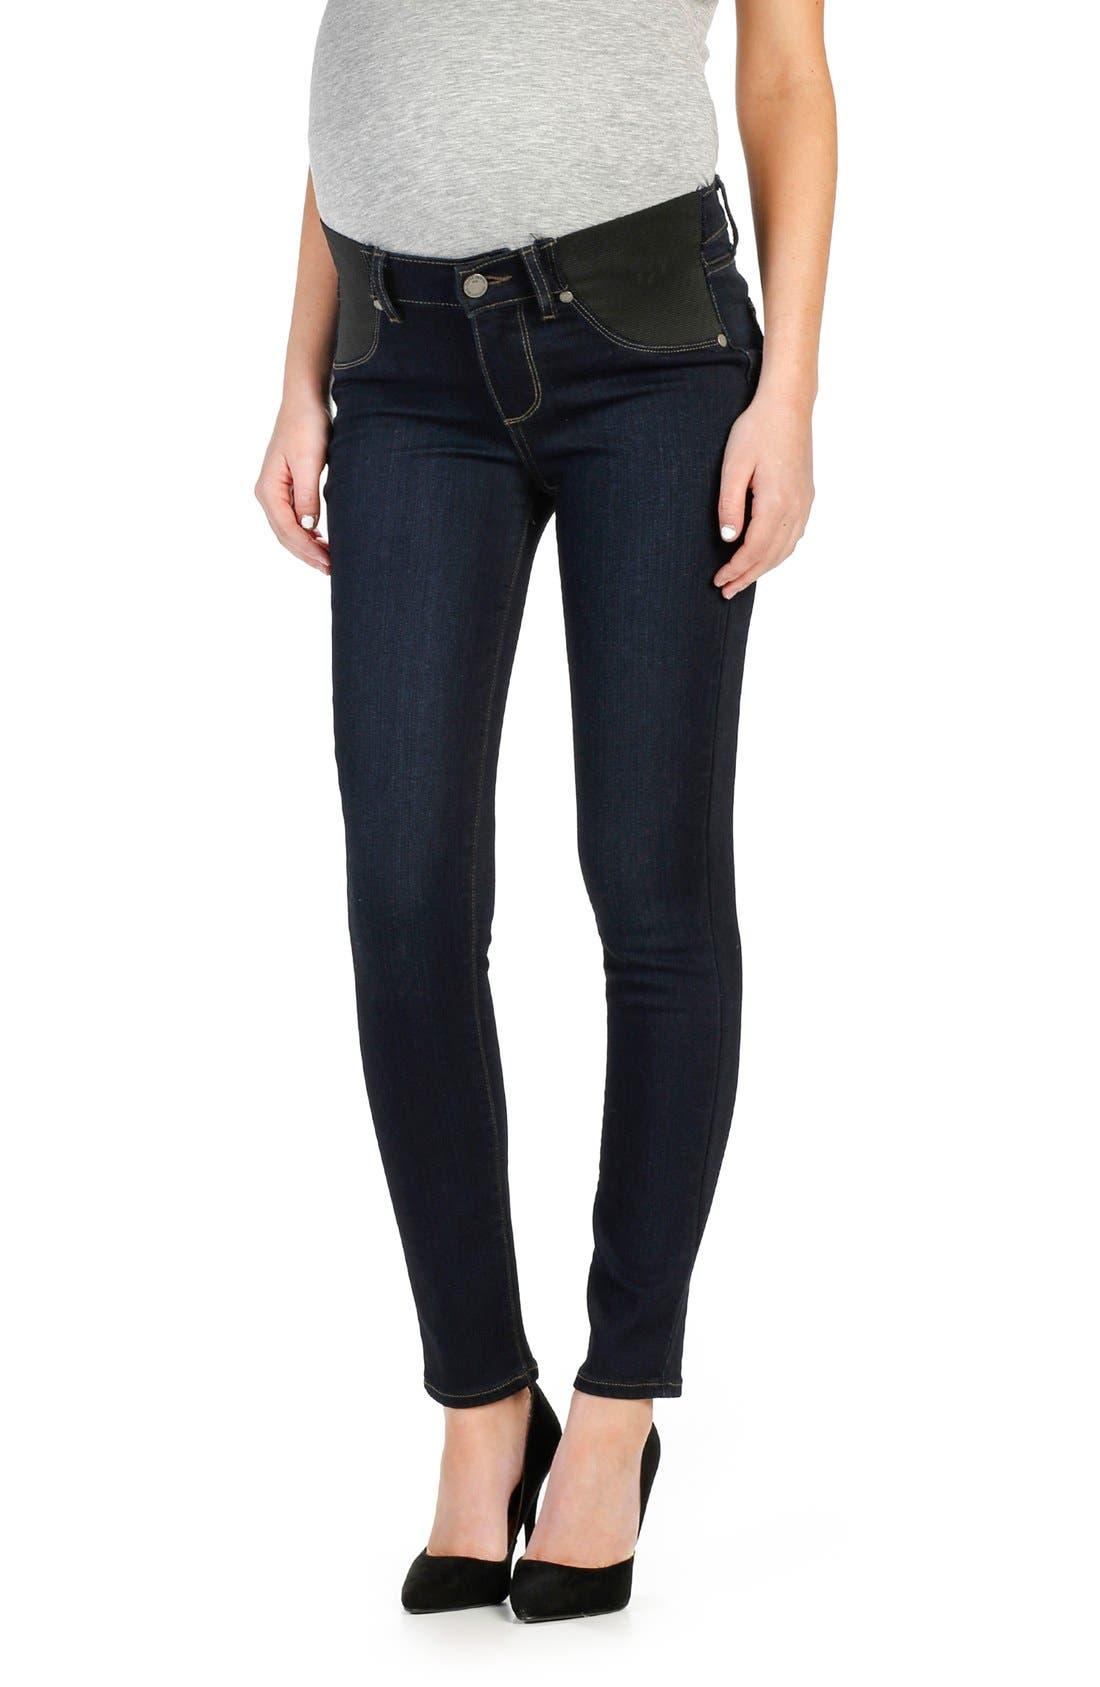 Main Image - PAIGE Transcend - Verdugo Ankle Skinny Maternity Jeans (Mona)